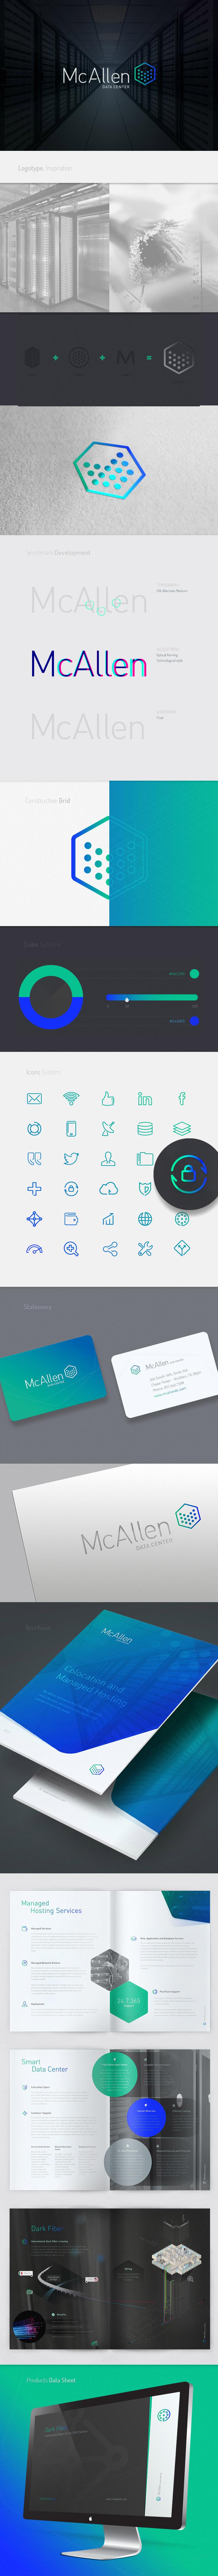 McAllen Data Center Branding by Lucas Gomez Freige